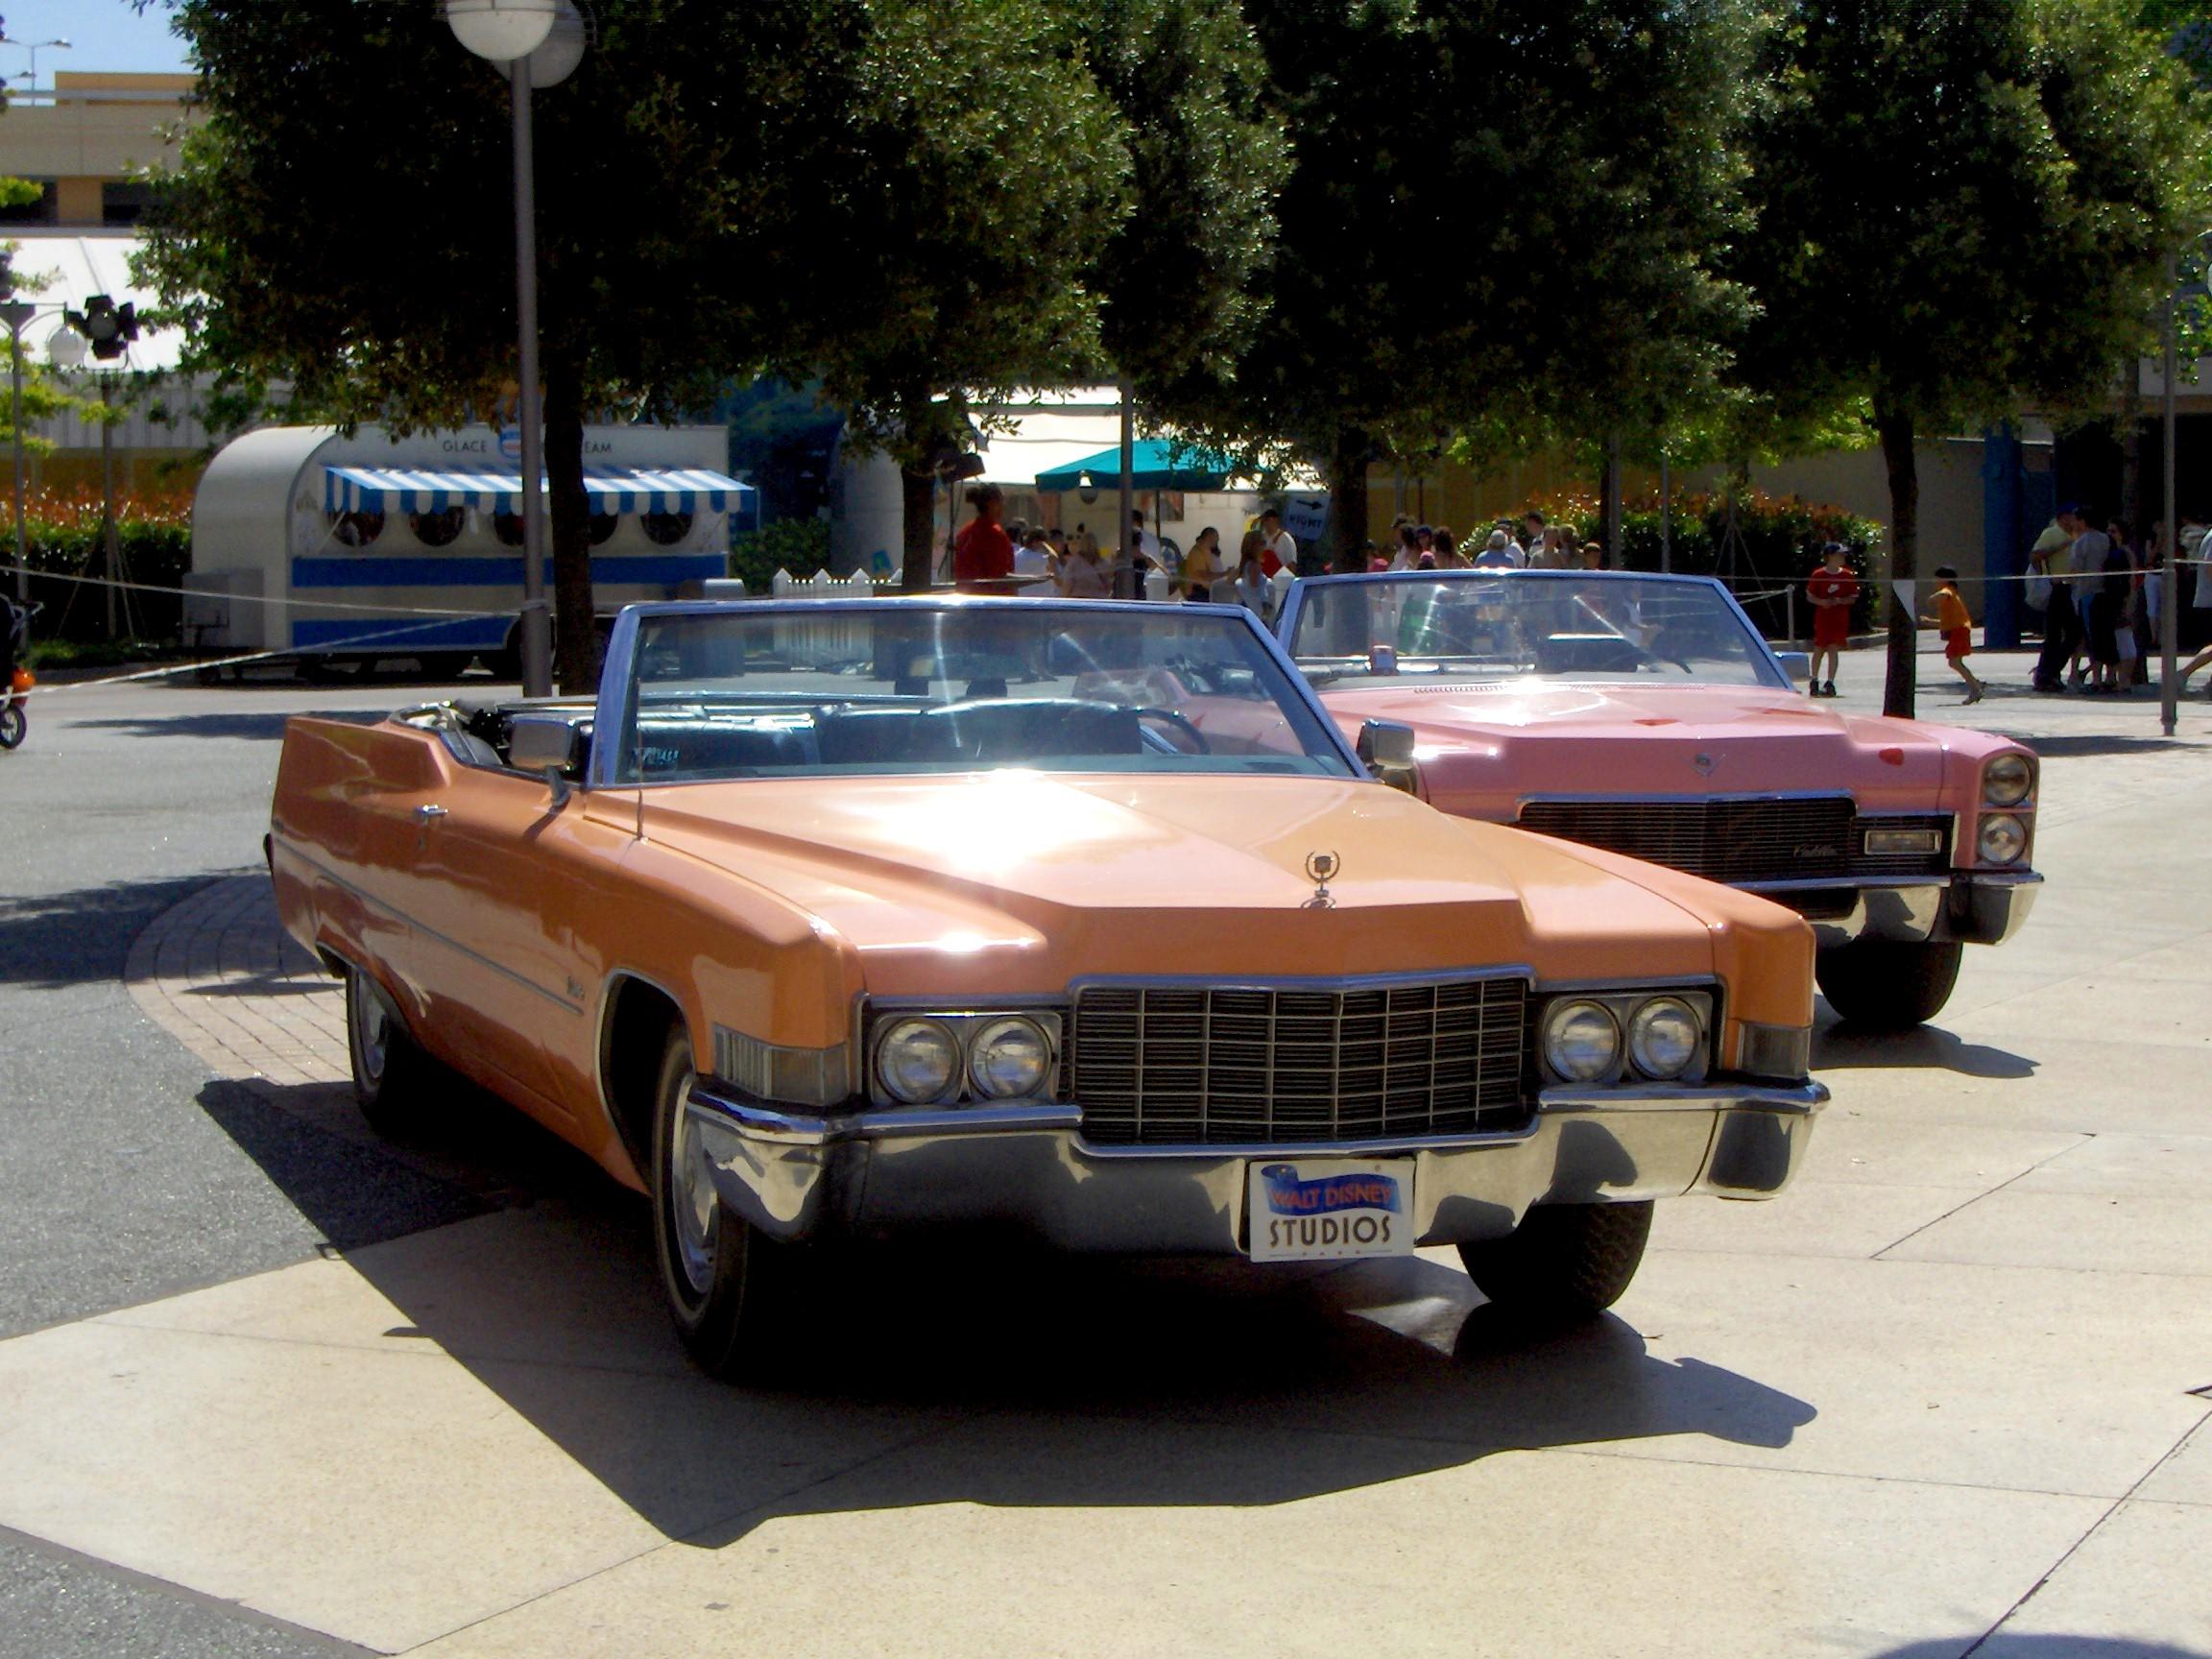 File:Moja fotka 1973 Cadillac Eldorado Convertible 0276.jpg ...